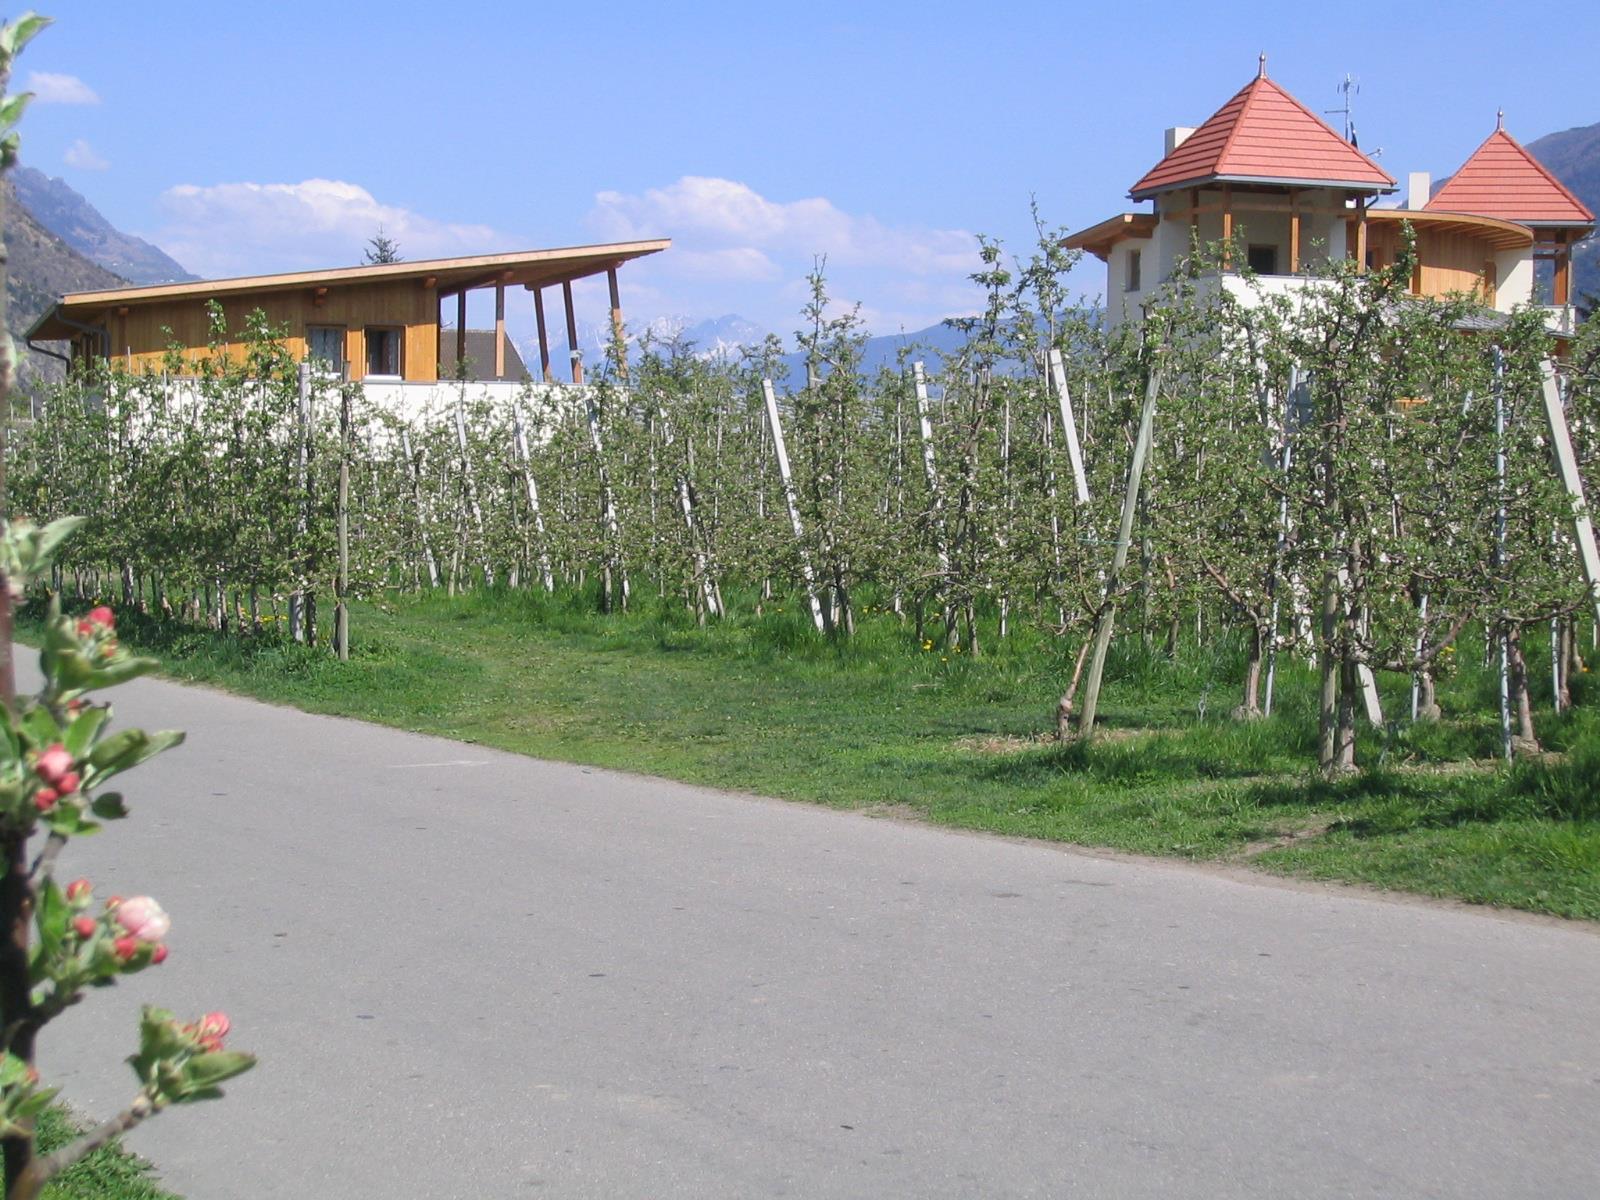 Weiss-Hof